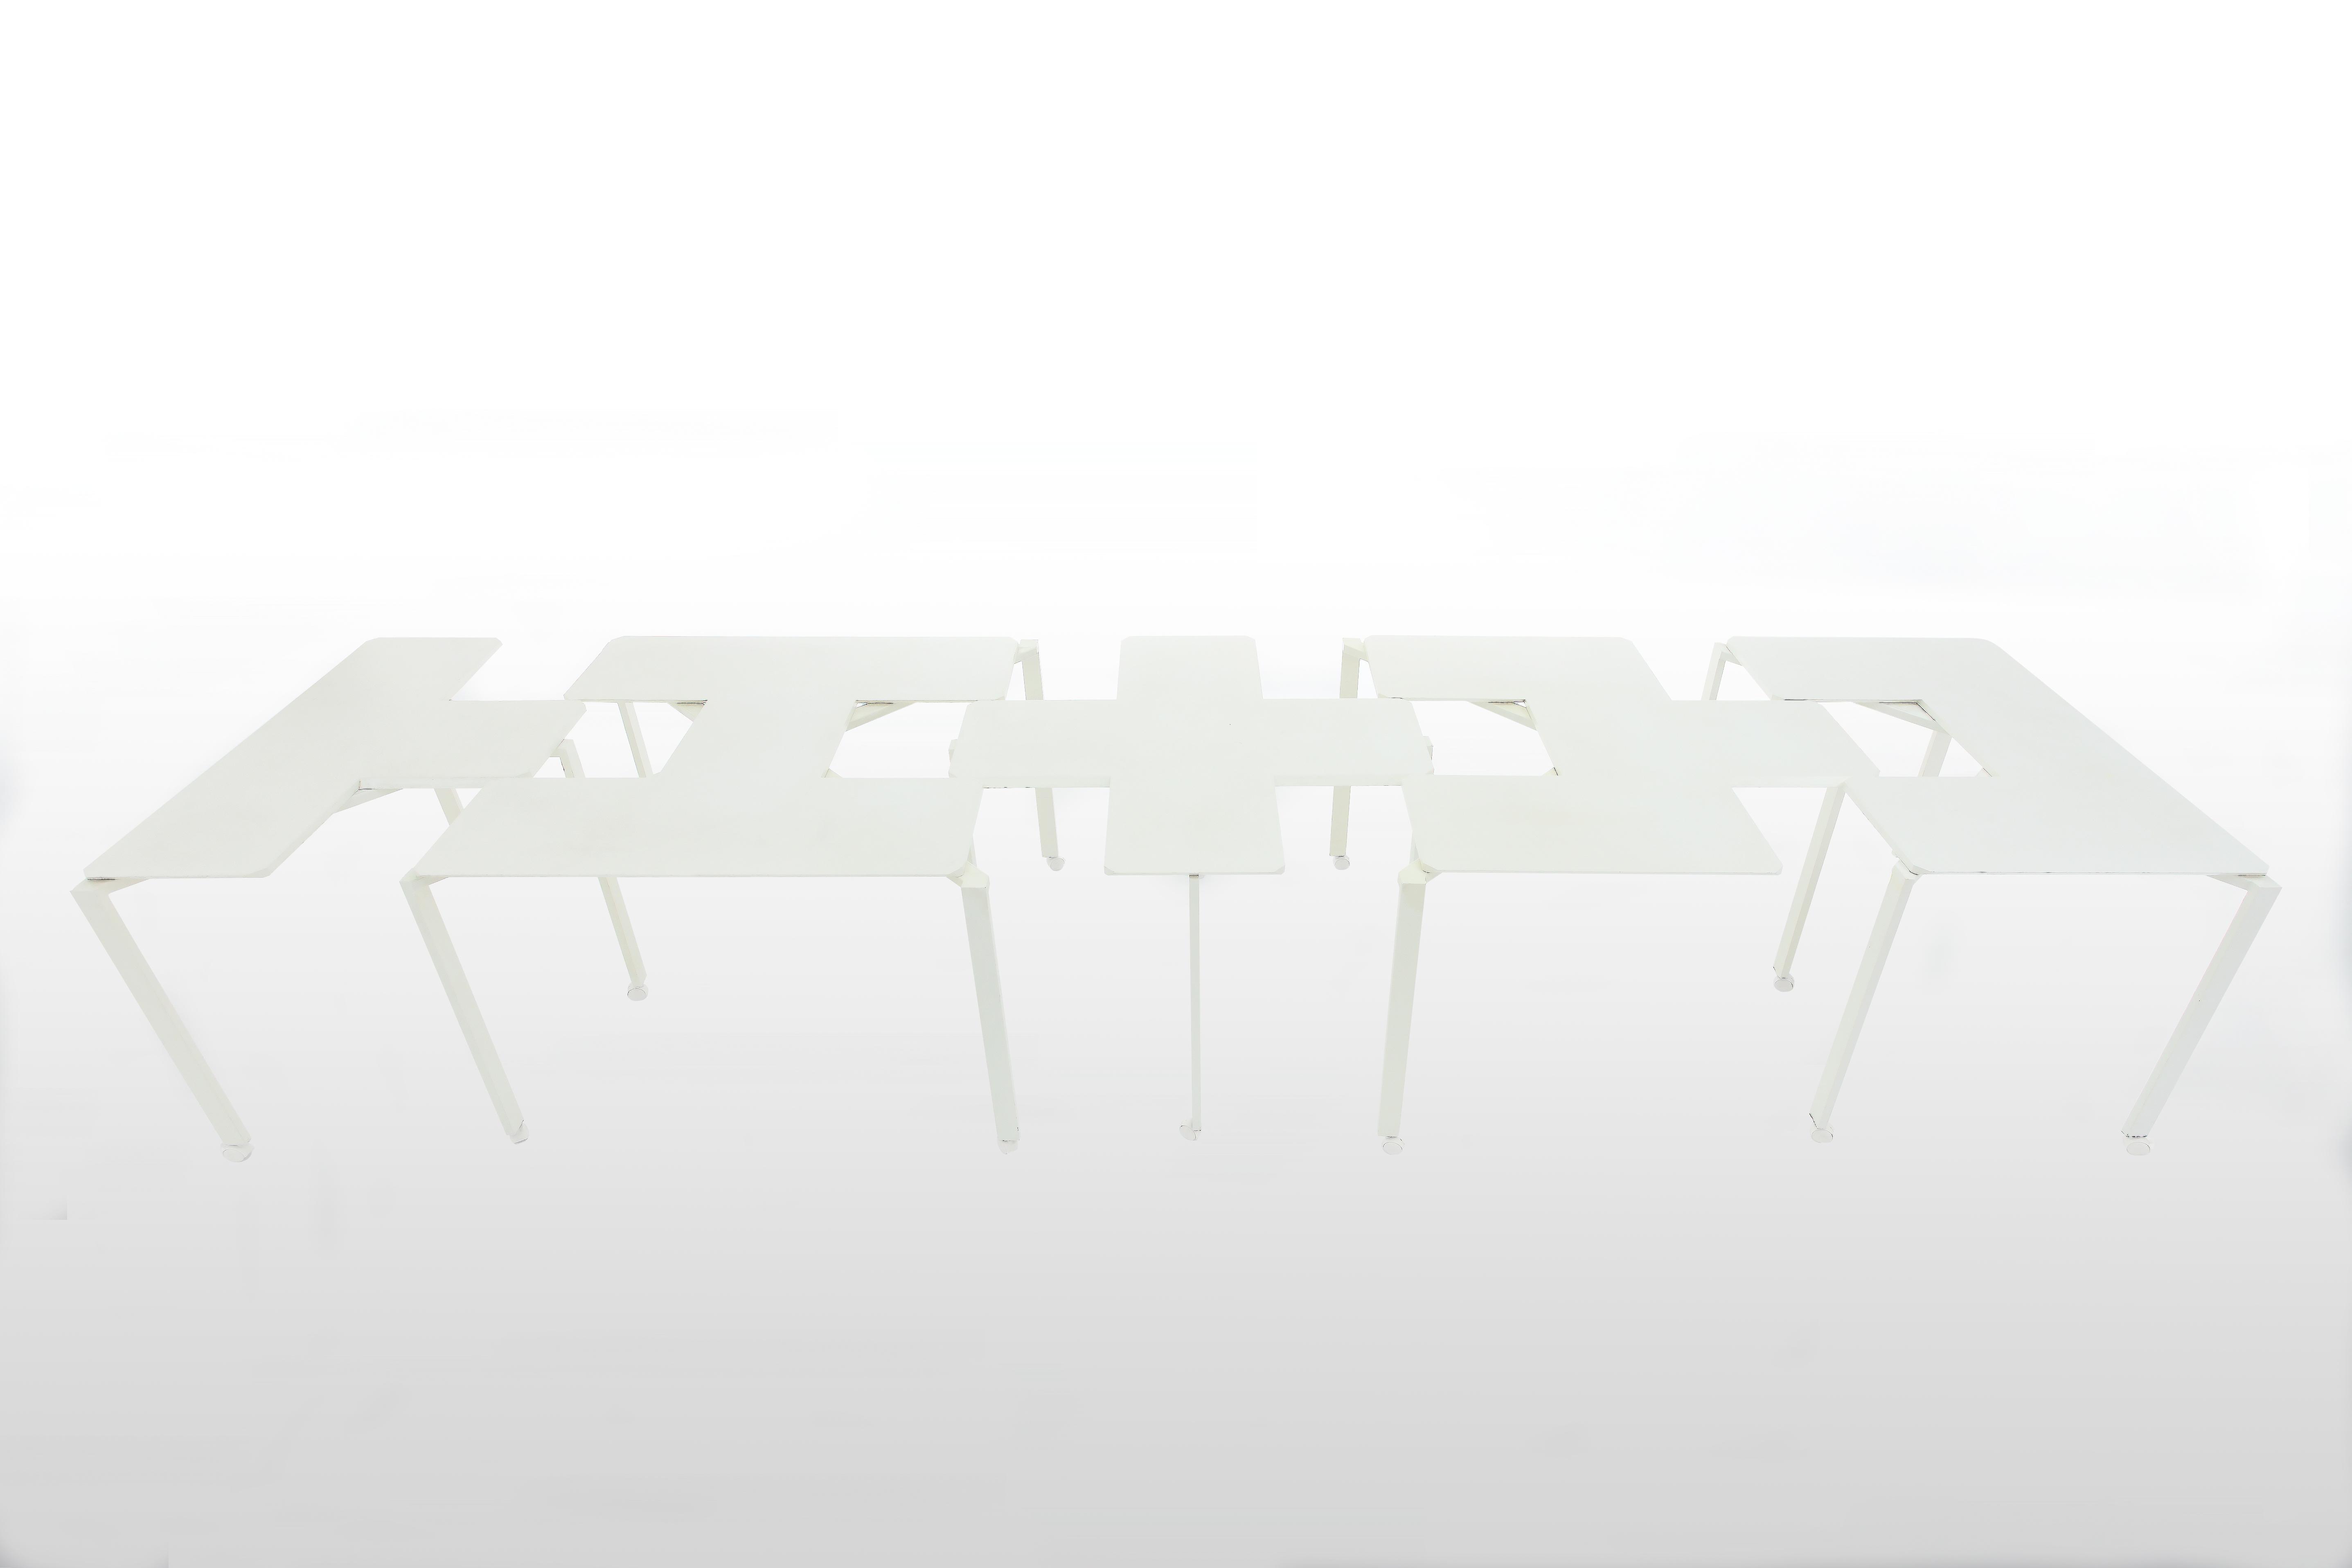 Tetris White combined 3_51 PHOTOS